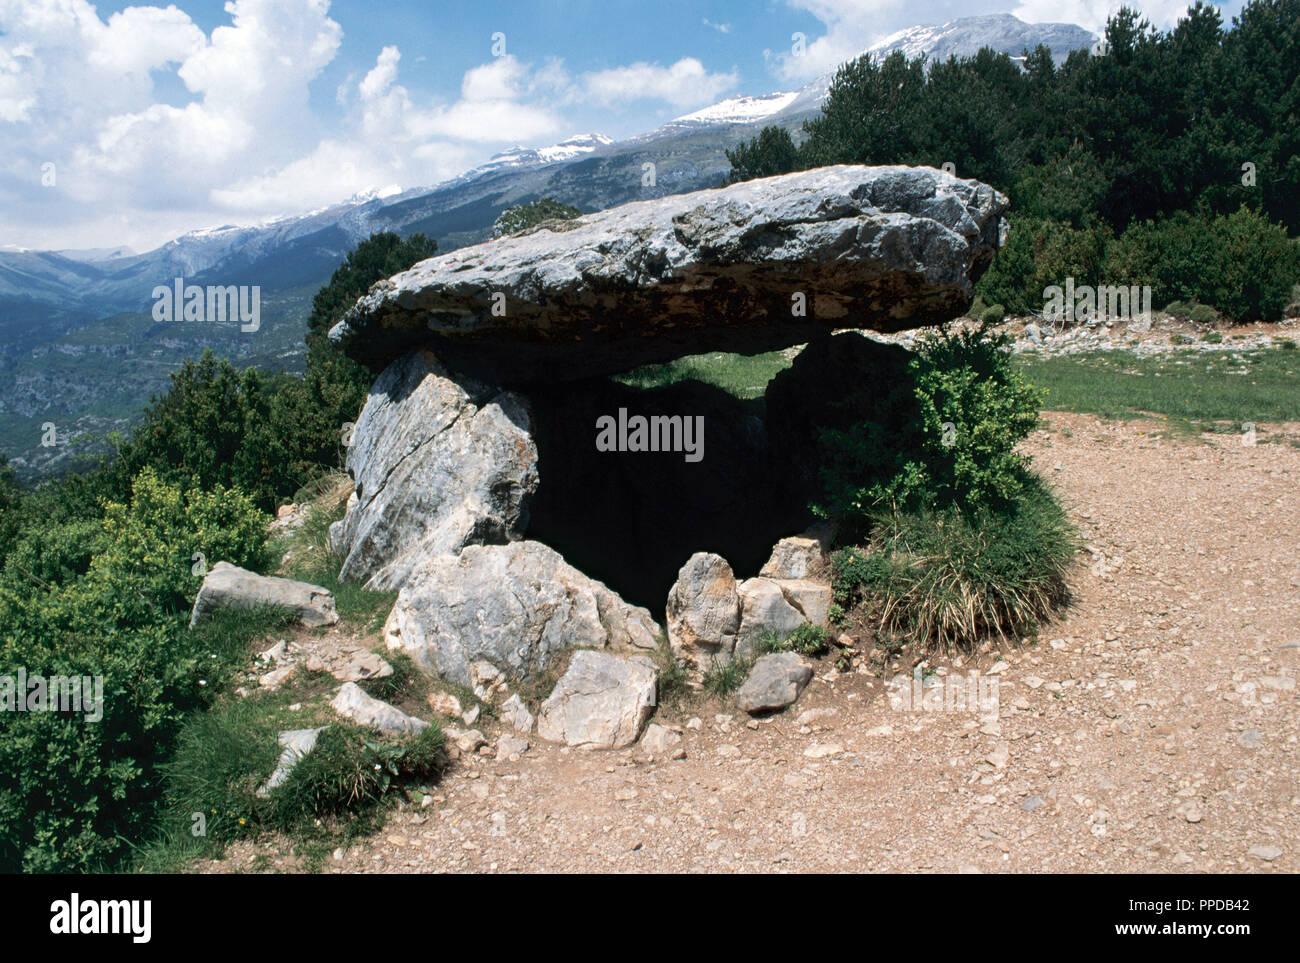 Dolmen of Tella. 4th millennium BC. Neolithic. Near Tella, province of Huesca, Aragon, Spain. Stock Photo